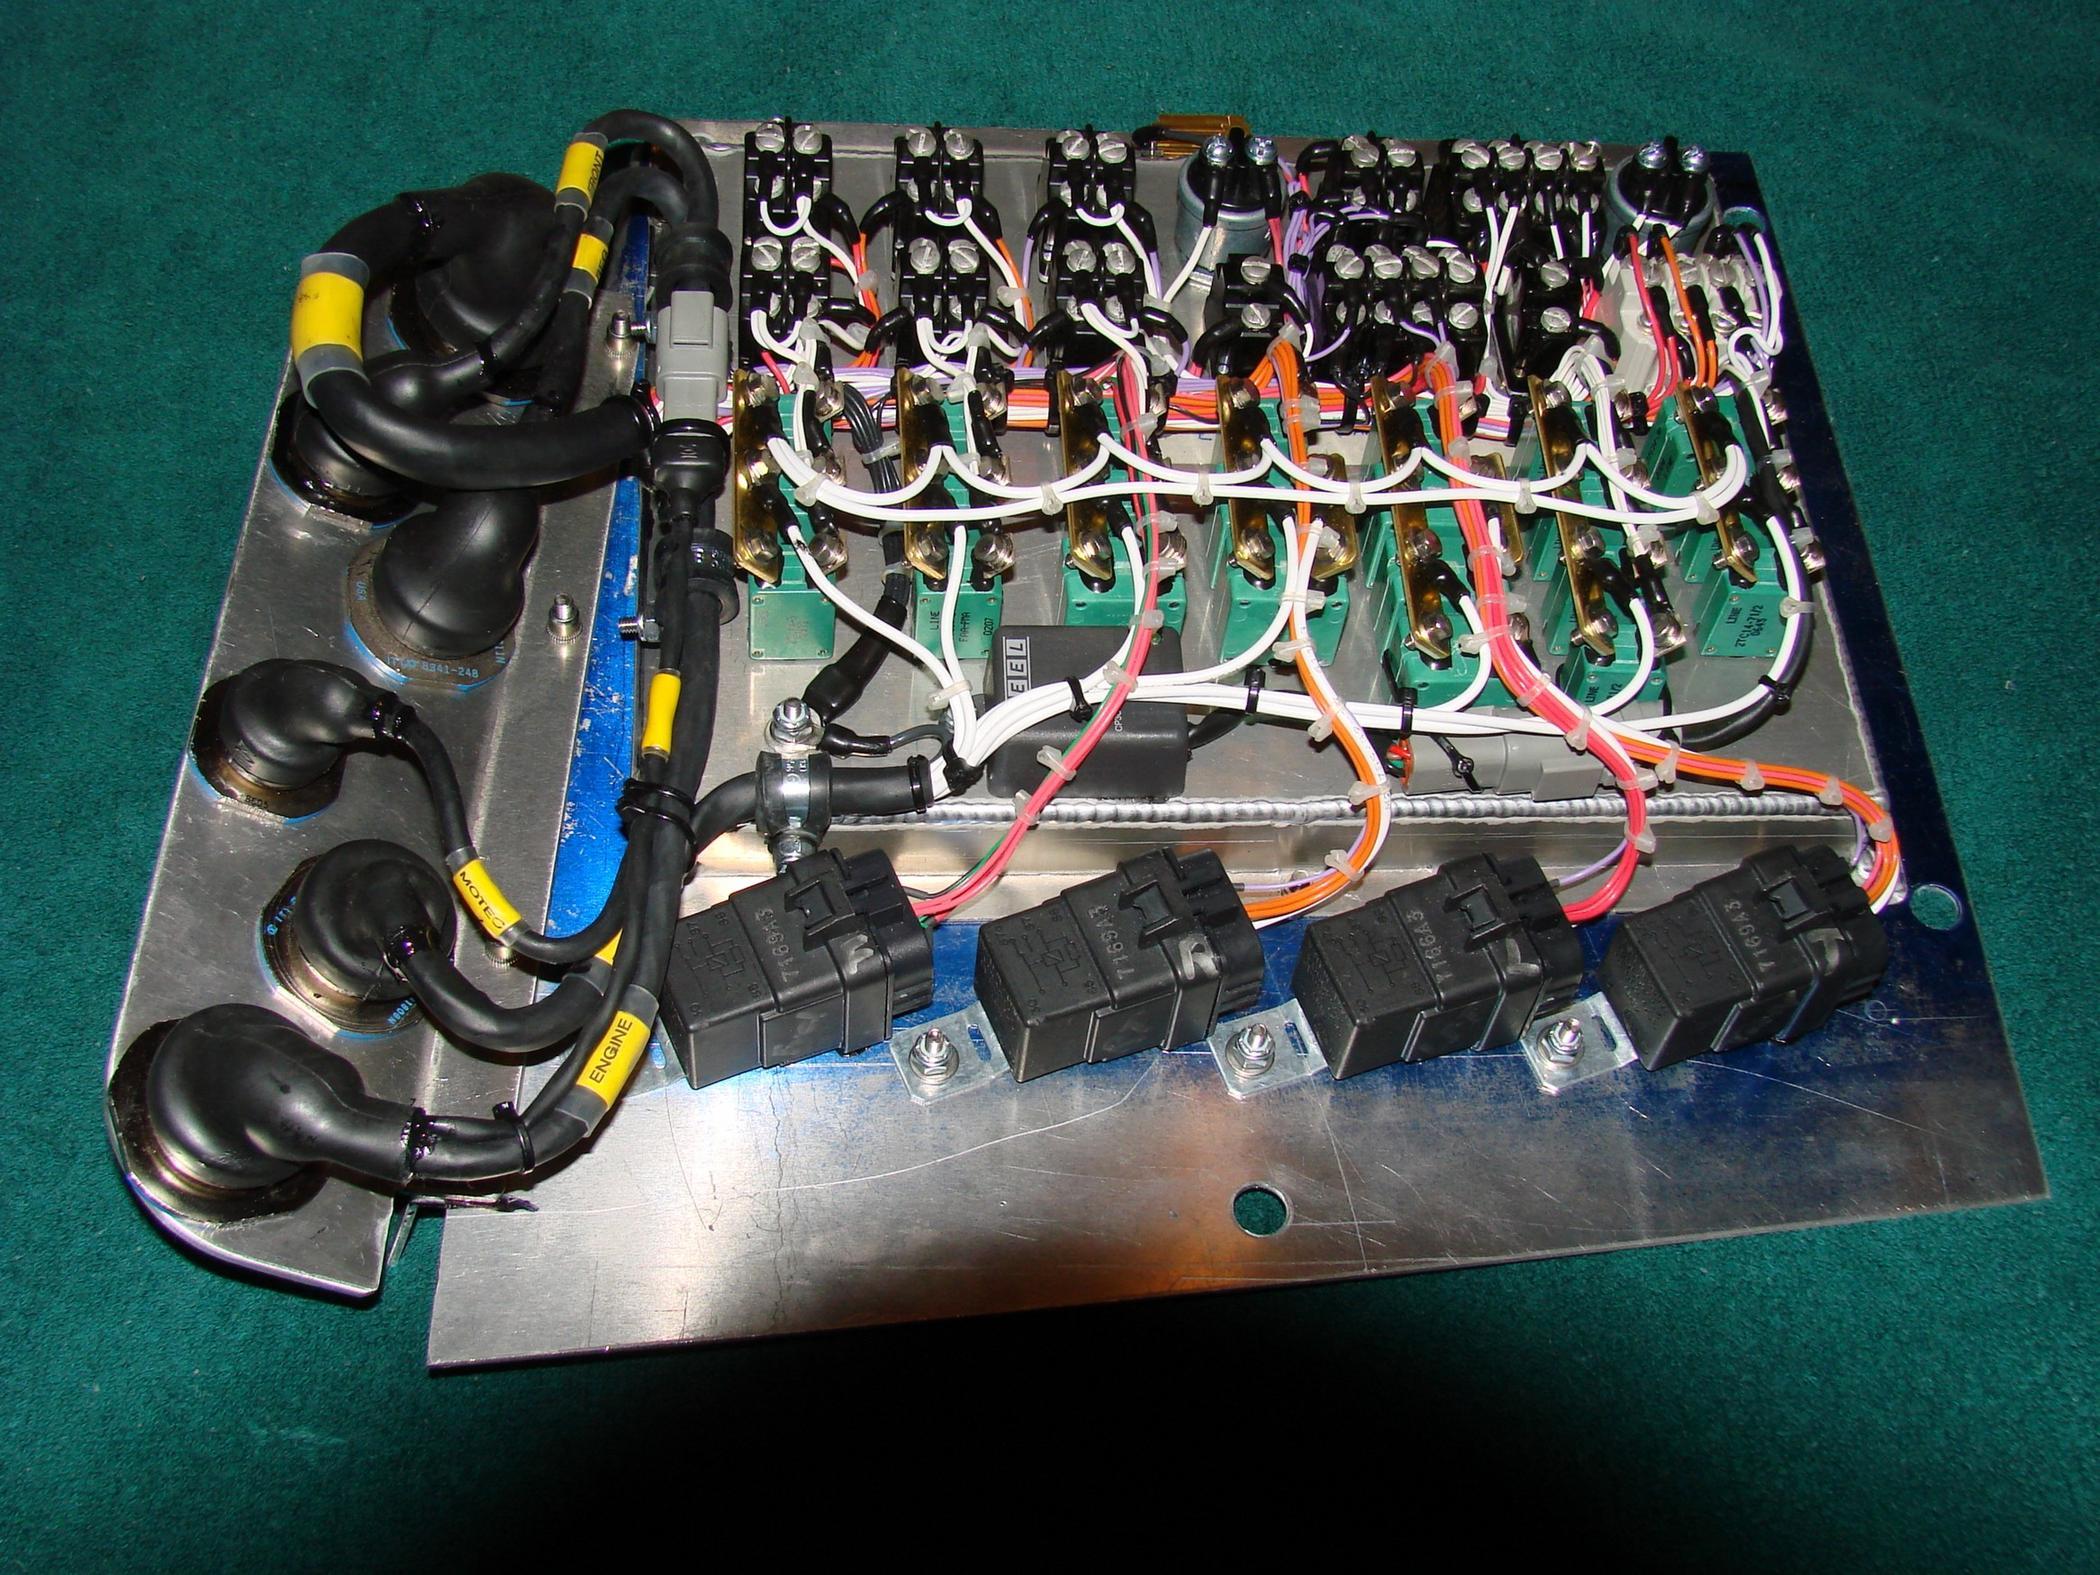 motorsport wiring harness supplies wiring solutions rh rausco com Automotive Wiring Supplies Battery Wiring